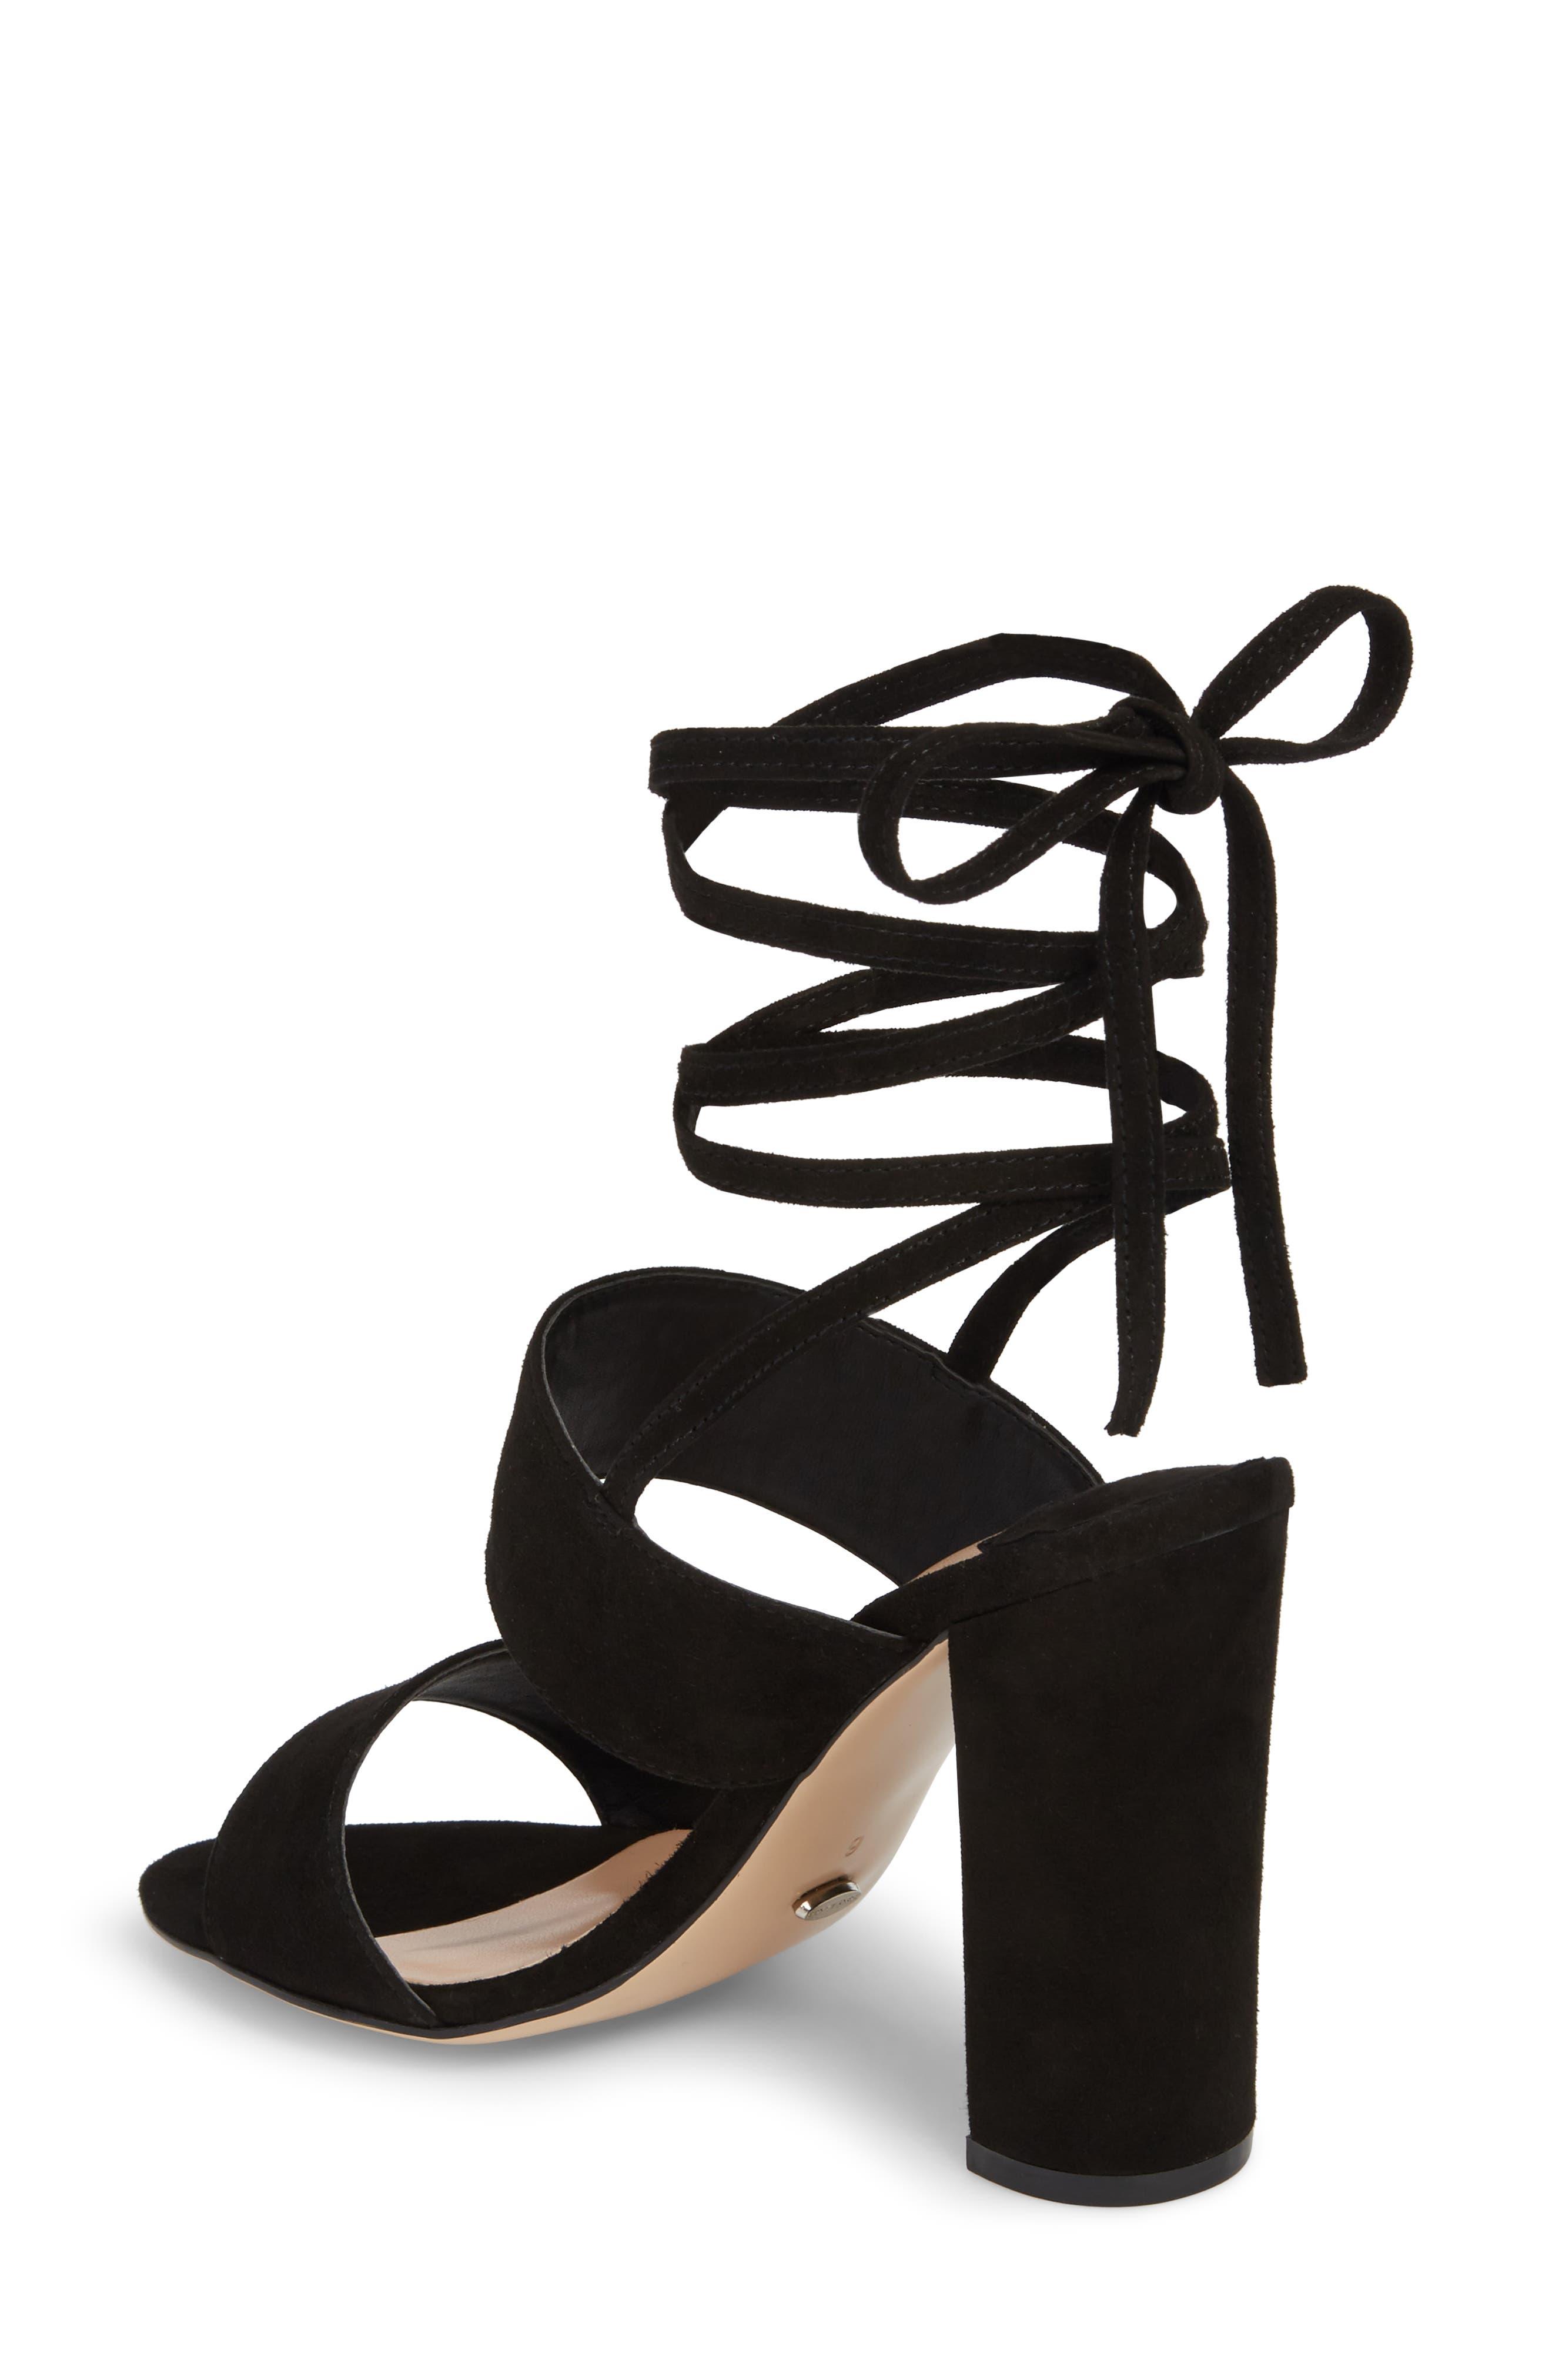 Kiko Ankle Tie Sandal,                             Alternate thumbnail 2, color,                             Black Suede